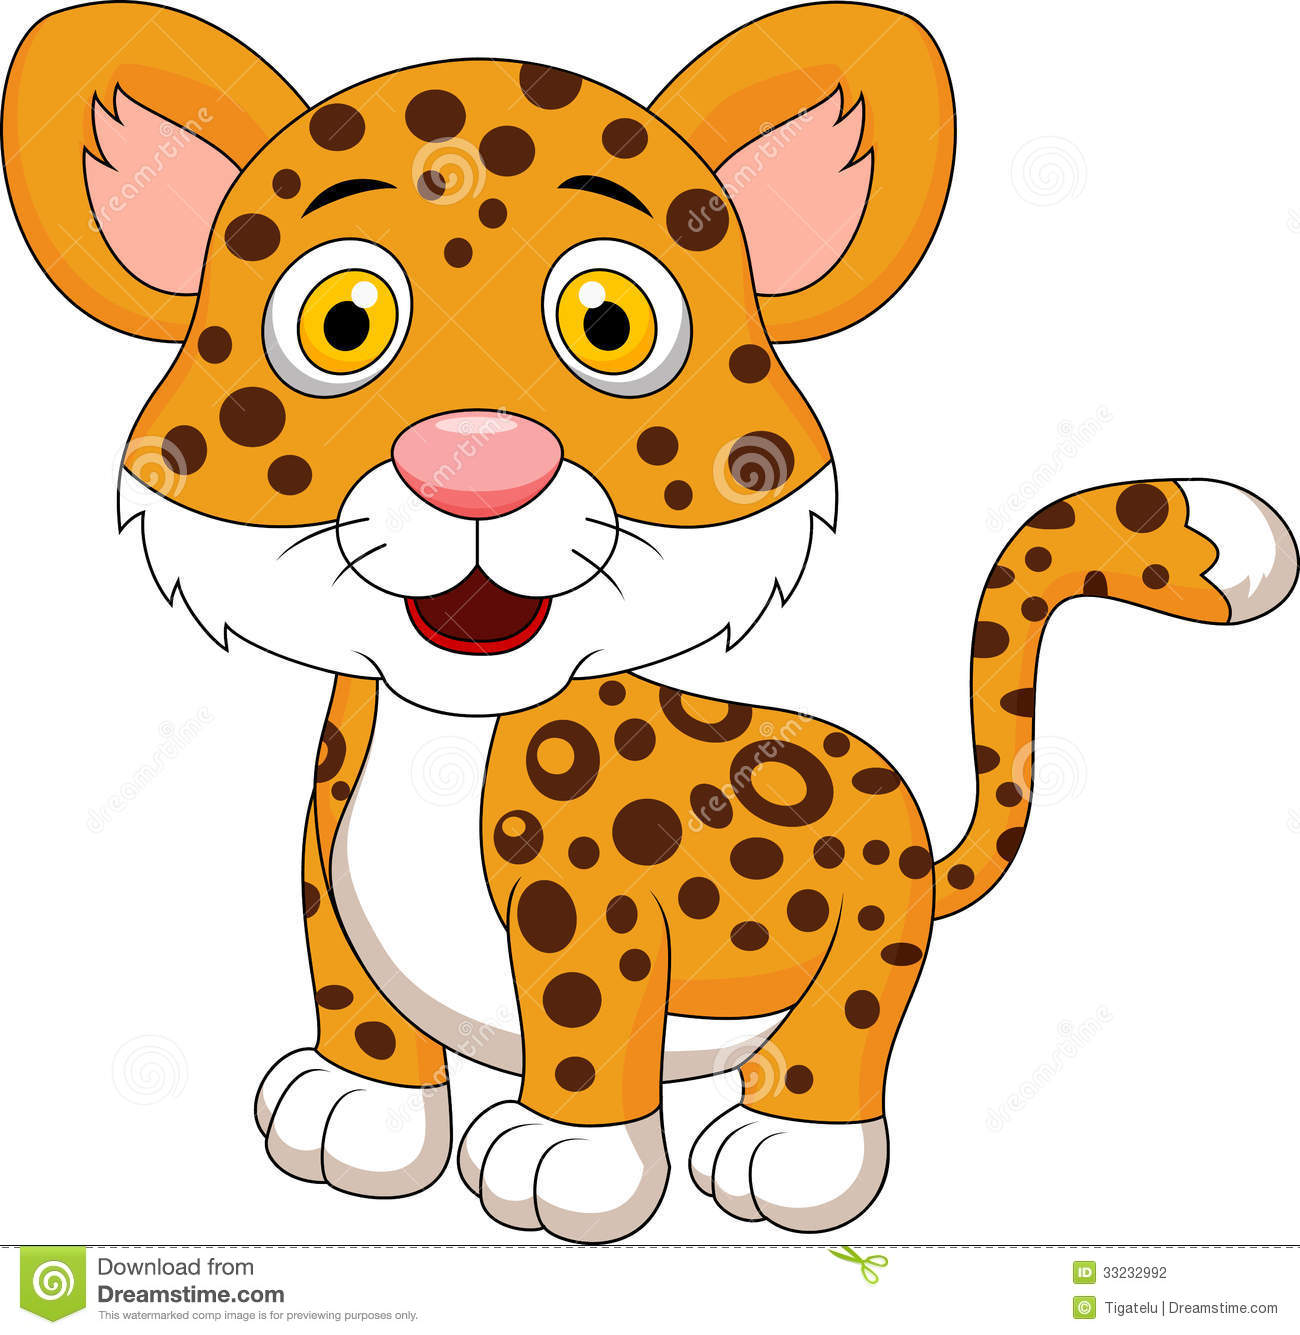 Cartoon Leopard Clipart #1-Cartoon Leopard Clipart #1-1